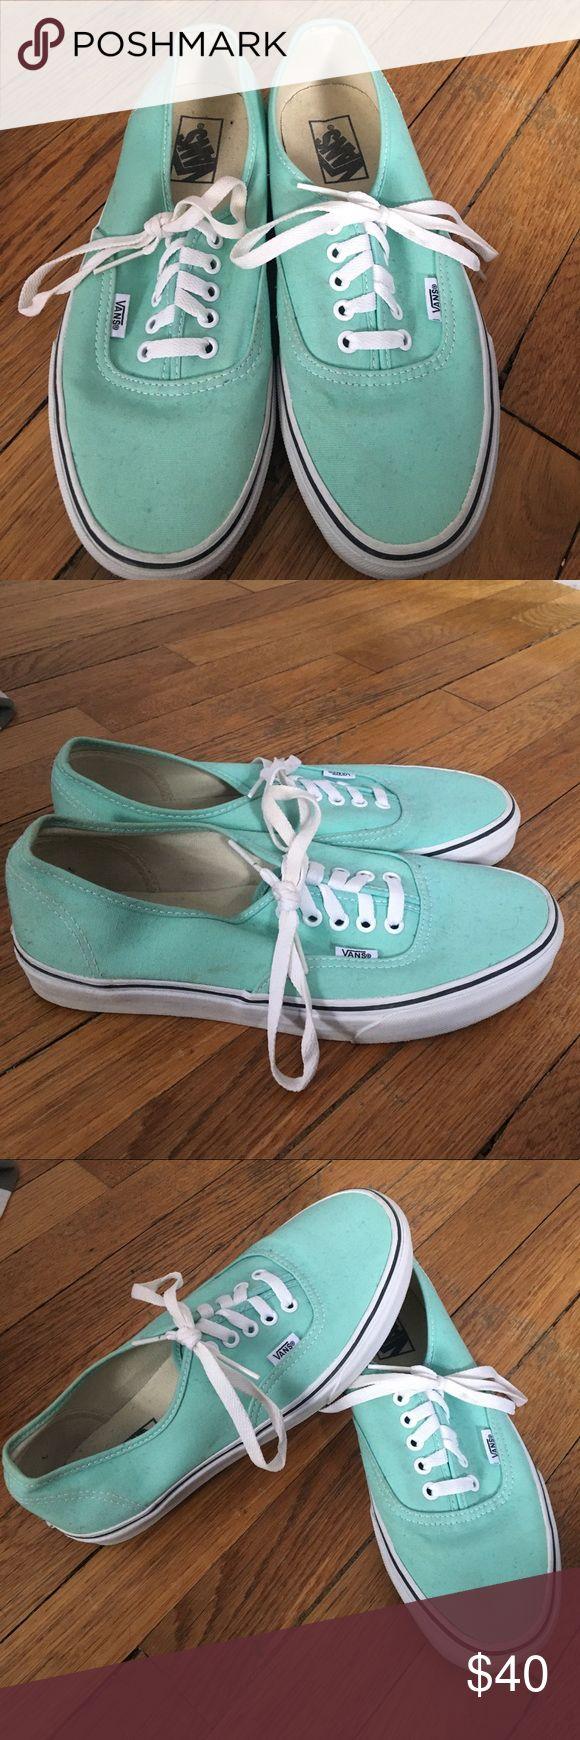 Mint Green Vans Men's Size 8 Unisex Worn a handful of times Vans Shoes Sneakers